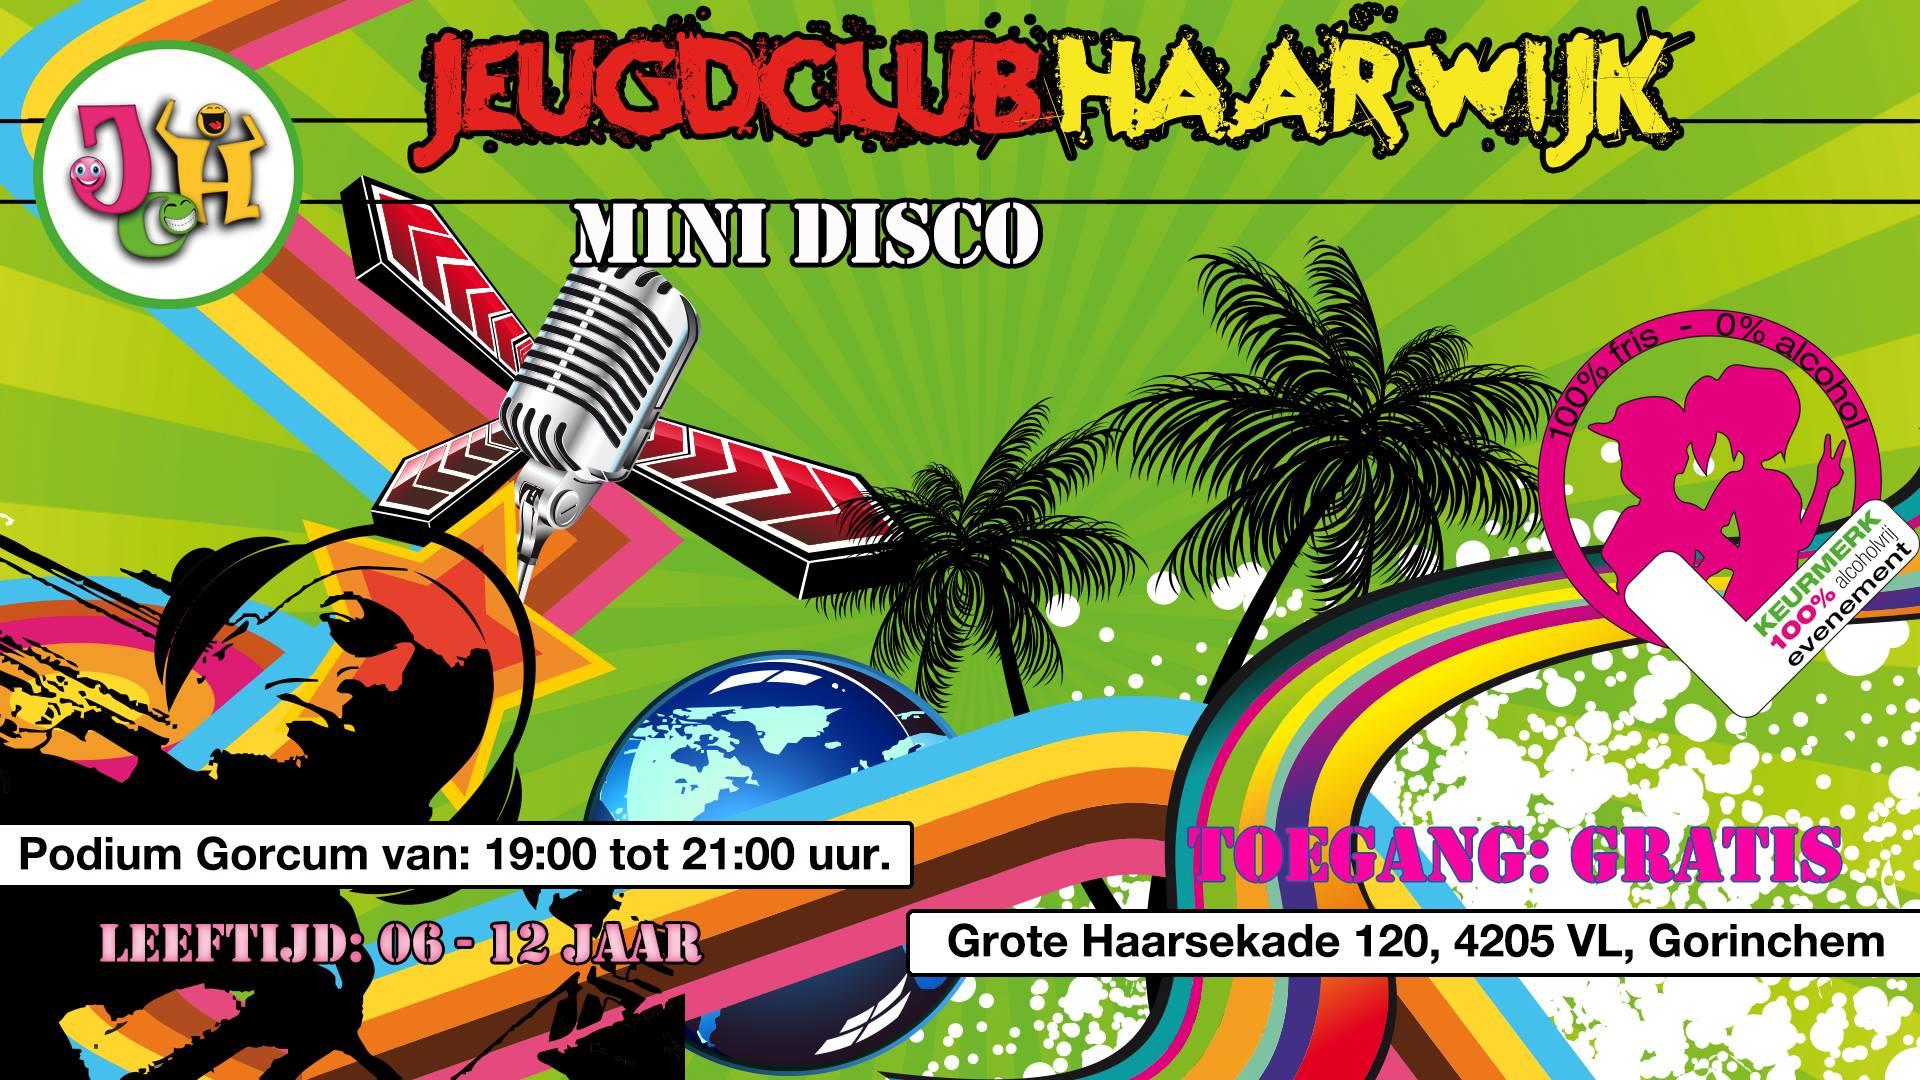 Mini Disco @ Jeugdclub-Haarwijk